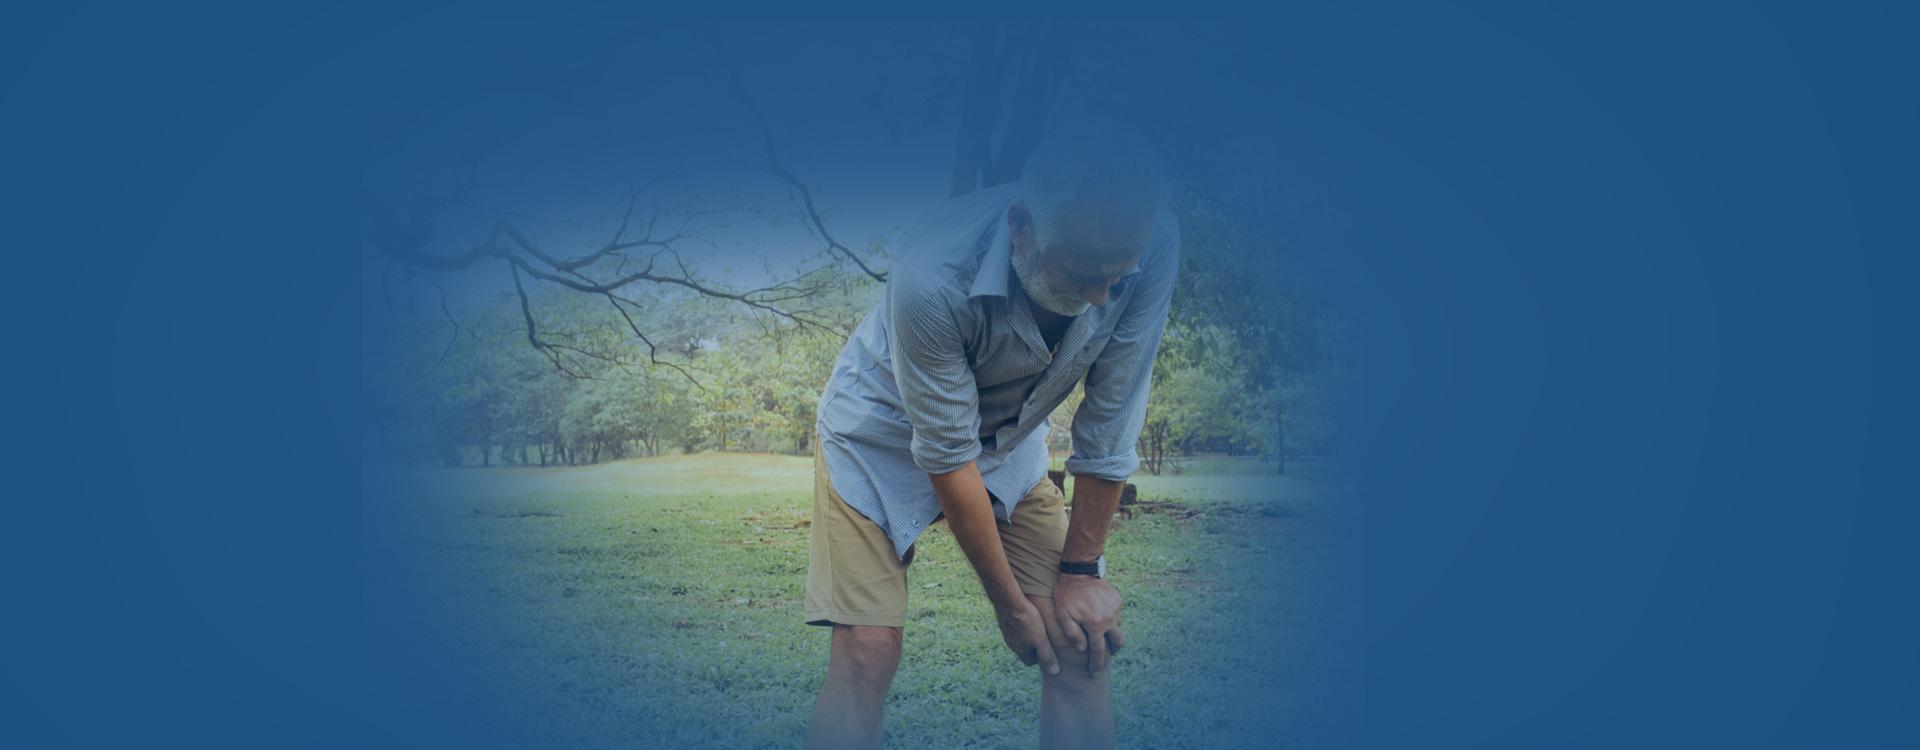 Guide to Treatment Options for Severe Knee Arthritis (Osteoarthritis